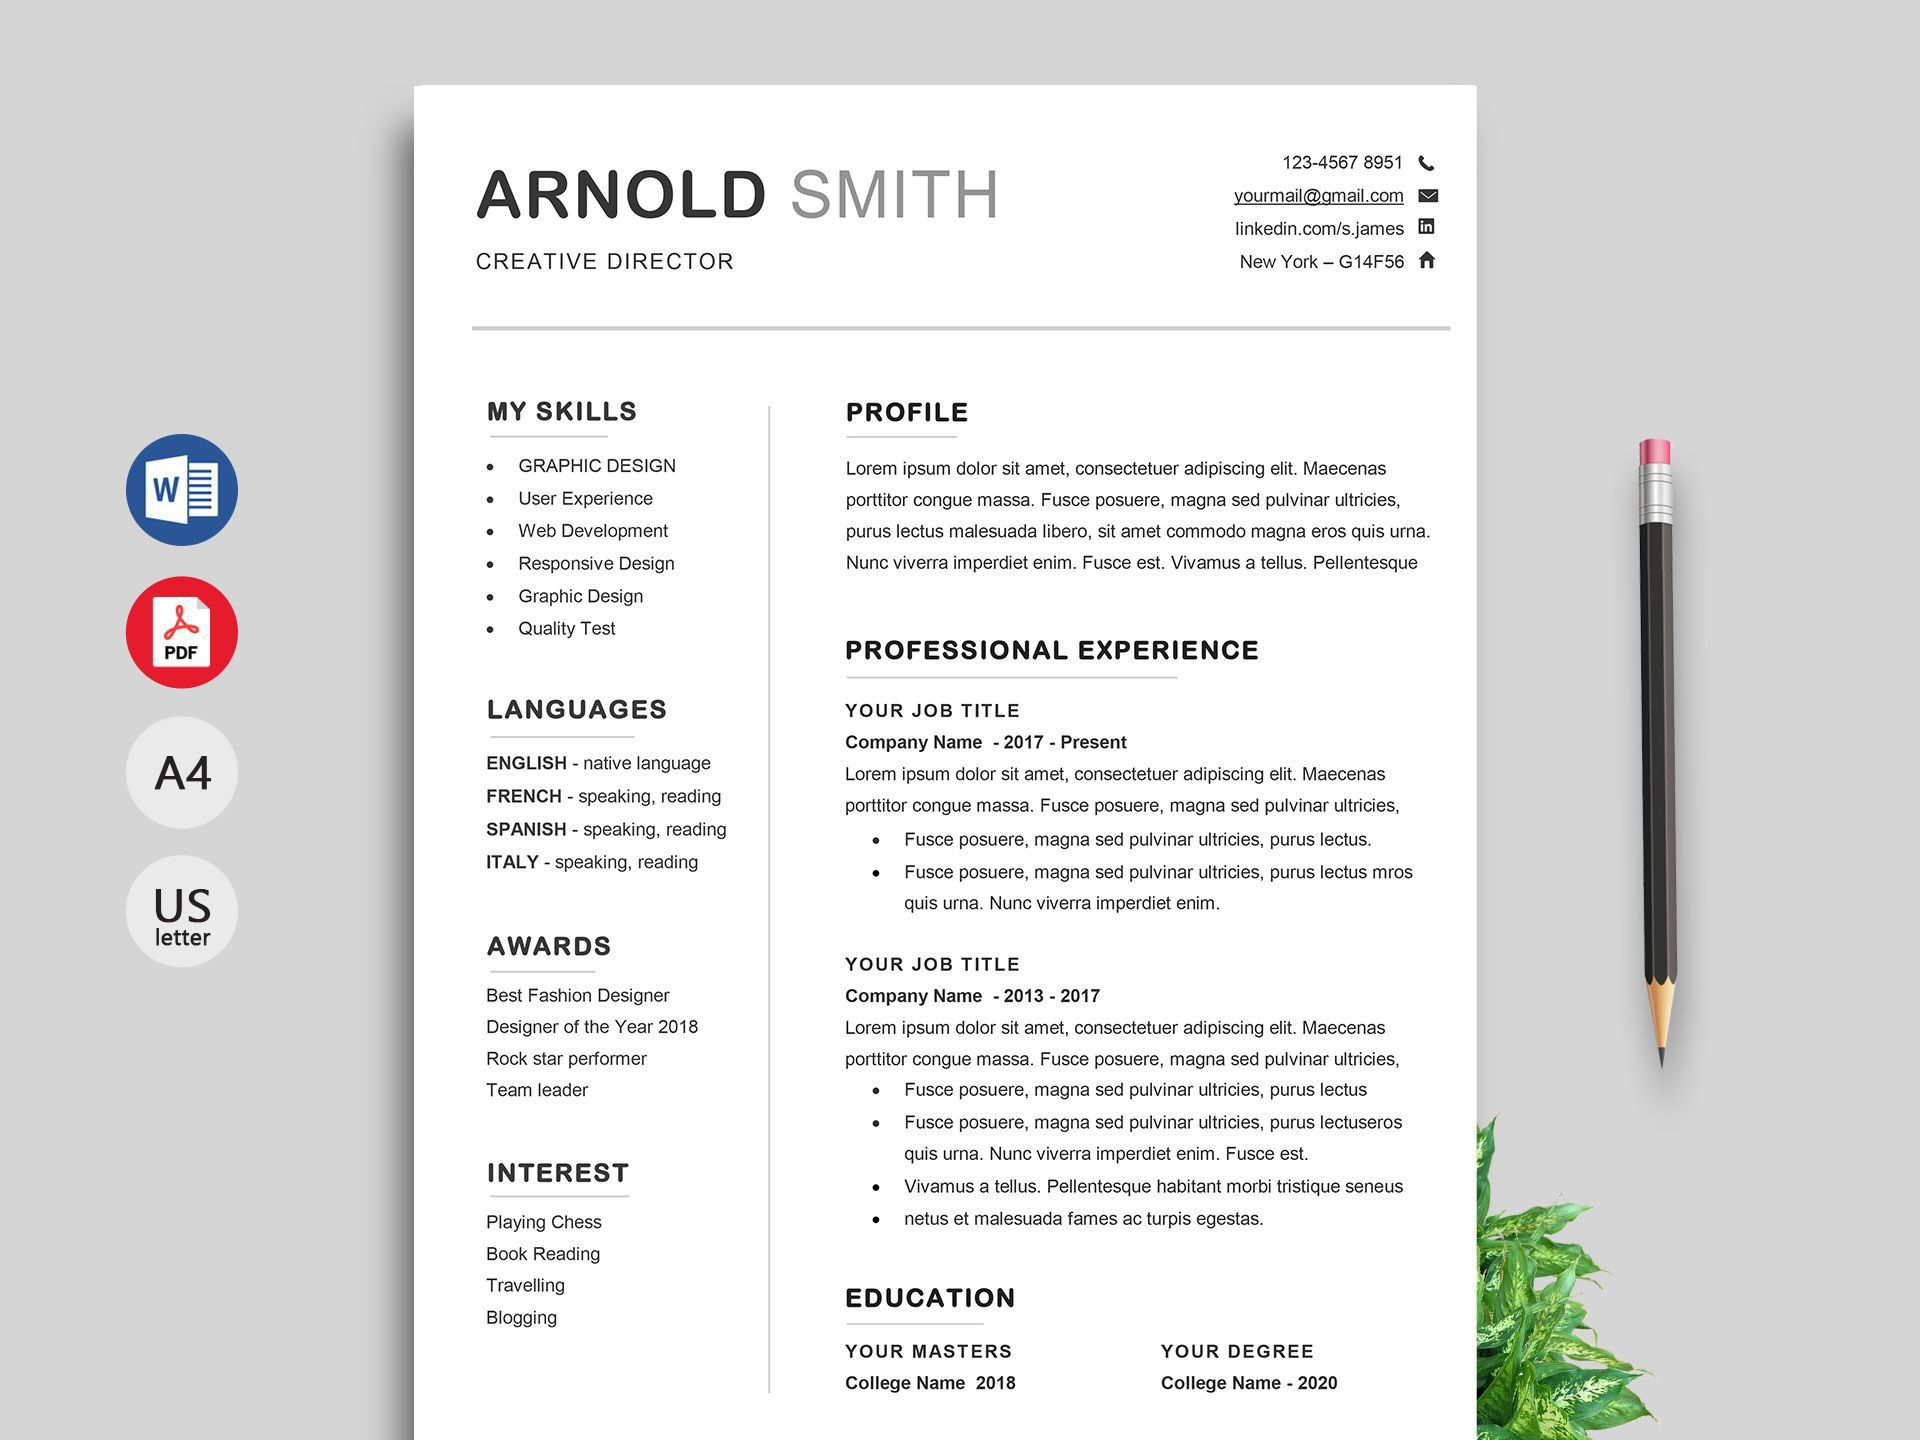 001 Unique Download Resume Sample Free High Resolution  Teacher Cv Graphic Designer Word Format Nurse TemplateFull